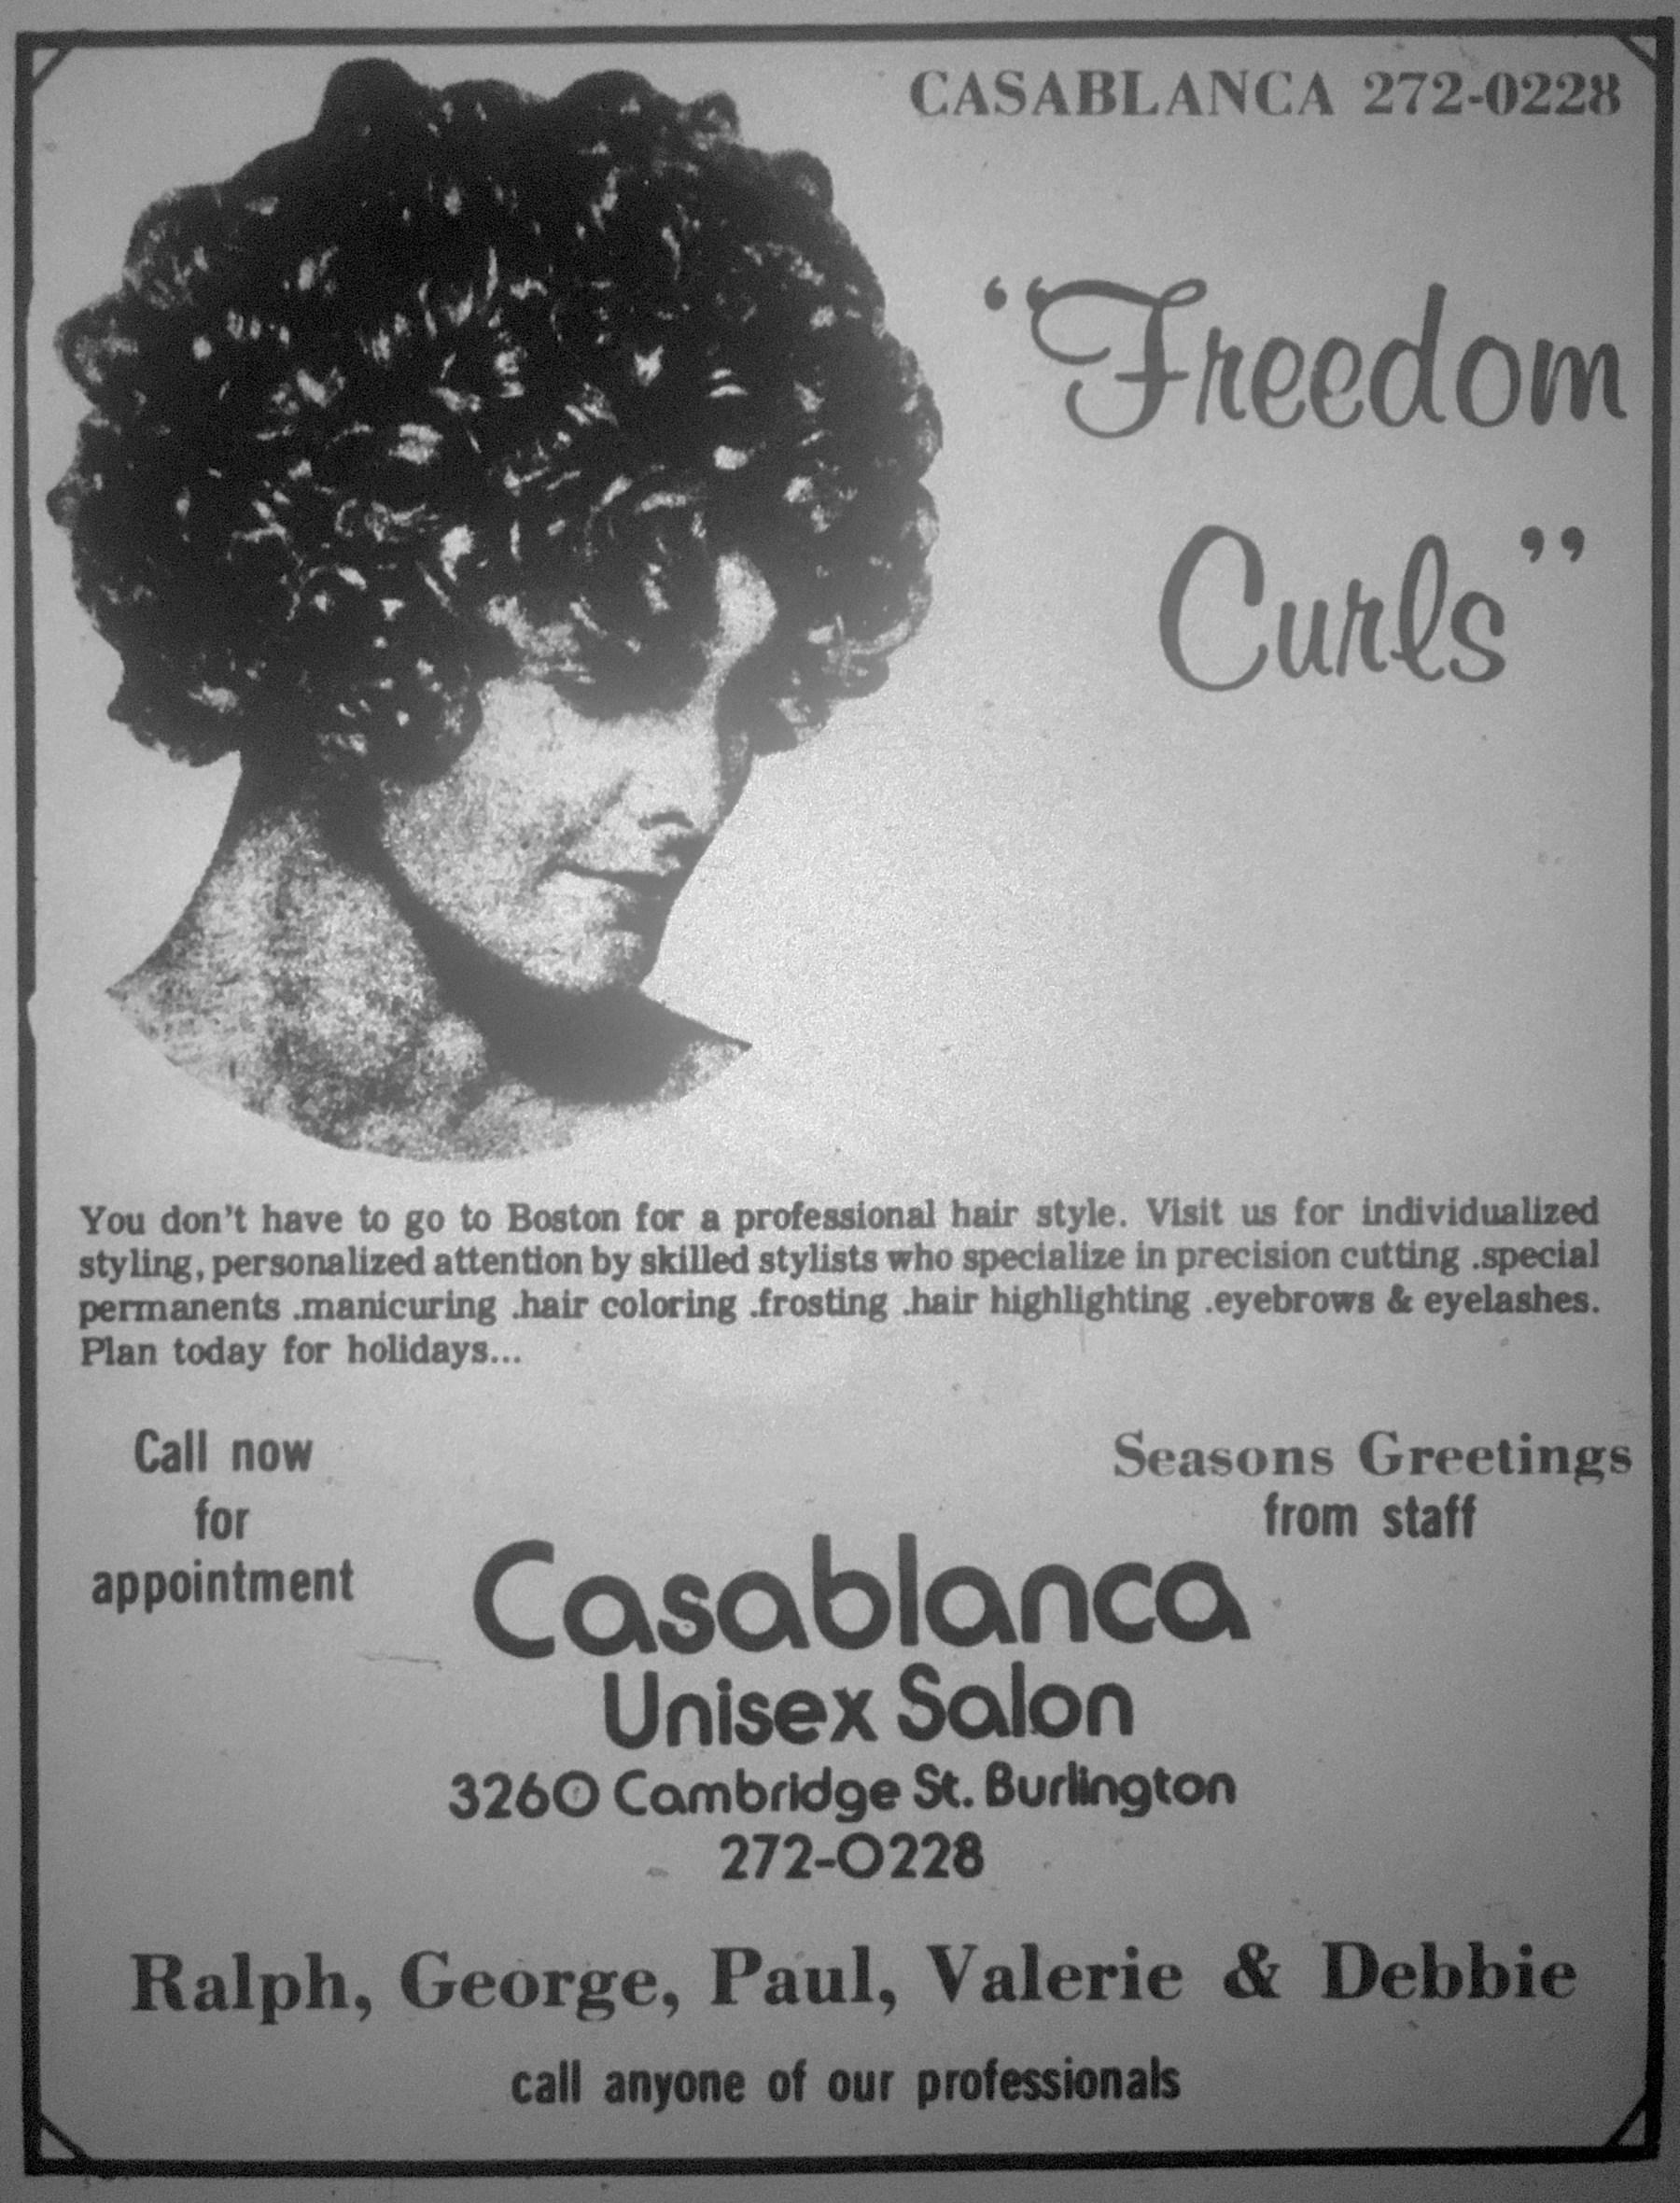 Casablanca Unisex Hair Salon Burlington MA